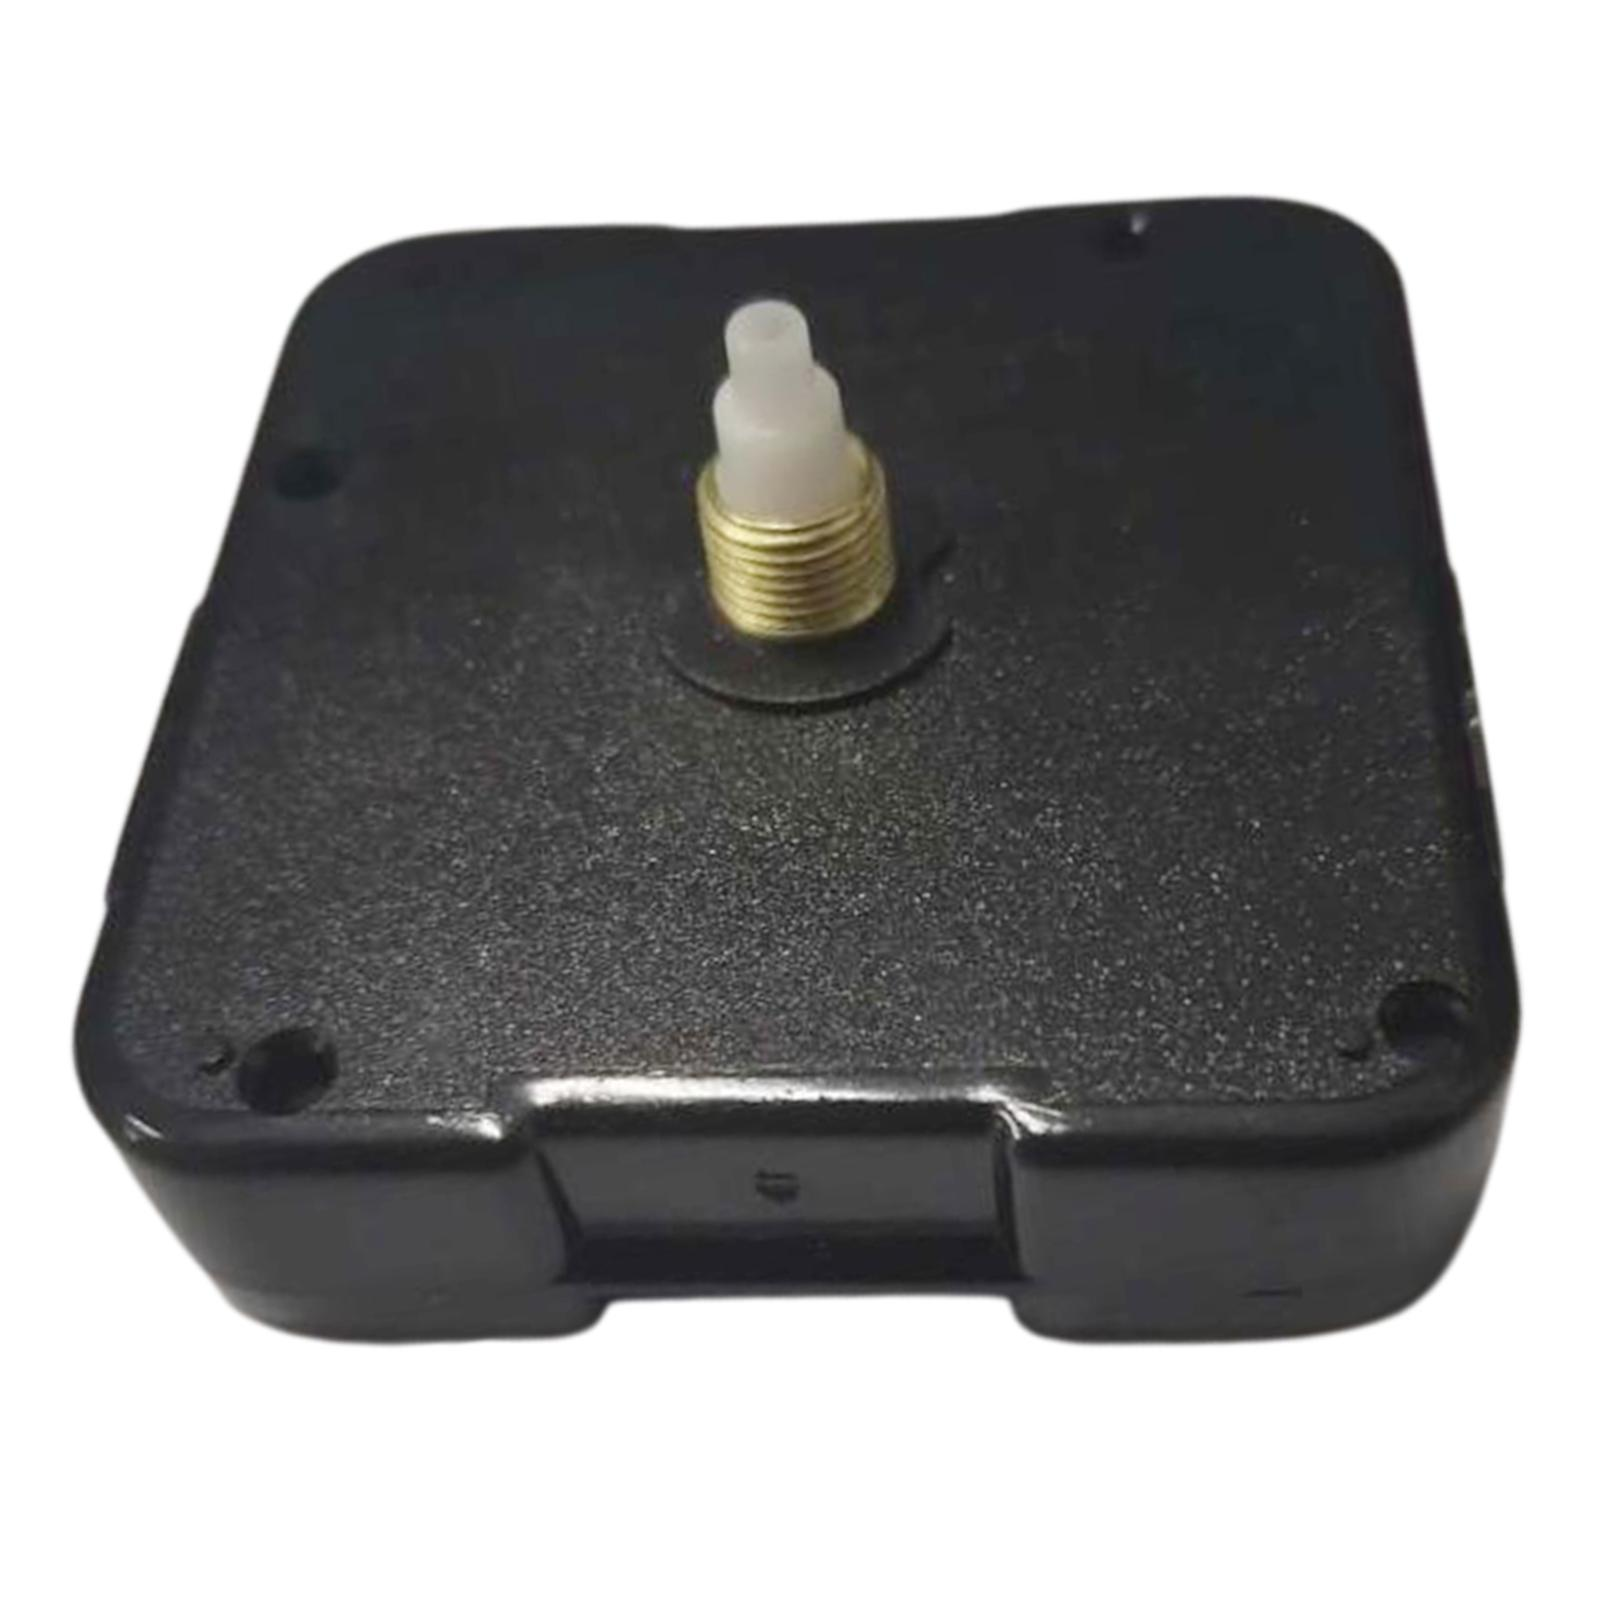 Mini Quartz Wall Clock KS302F-M 13mm Shaft Clock Repair Parts Replace Watchmaker Accessories